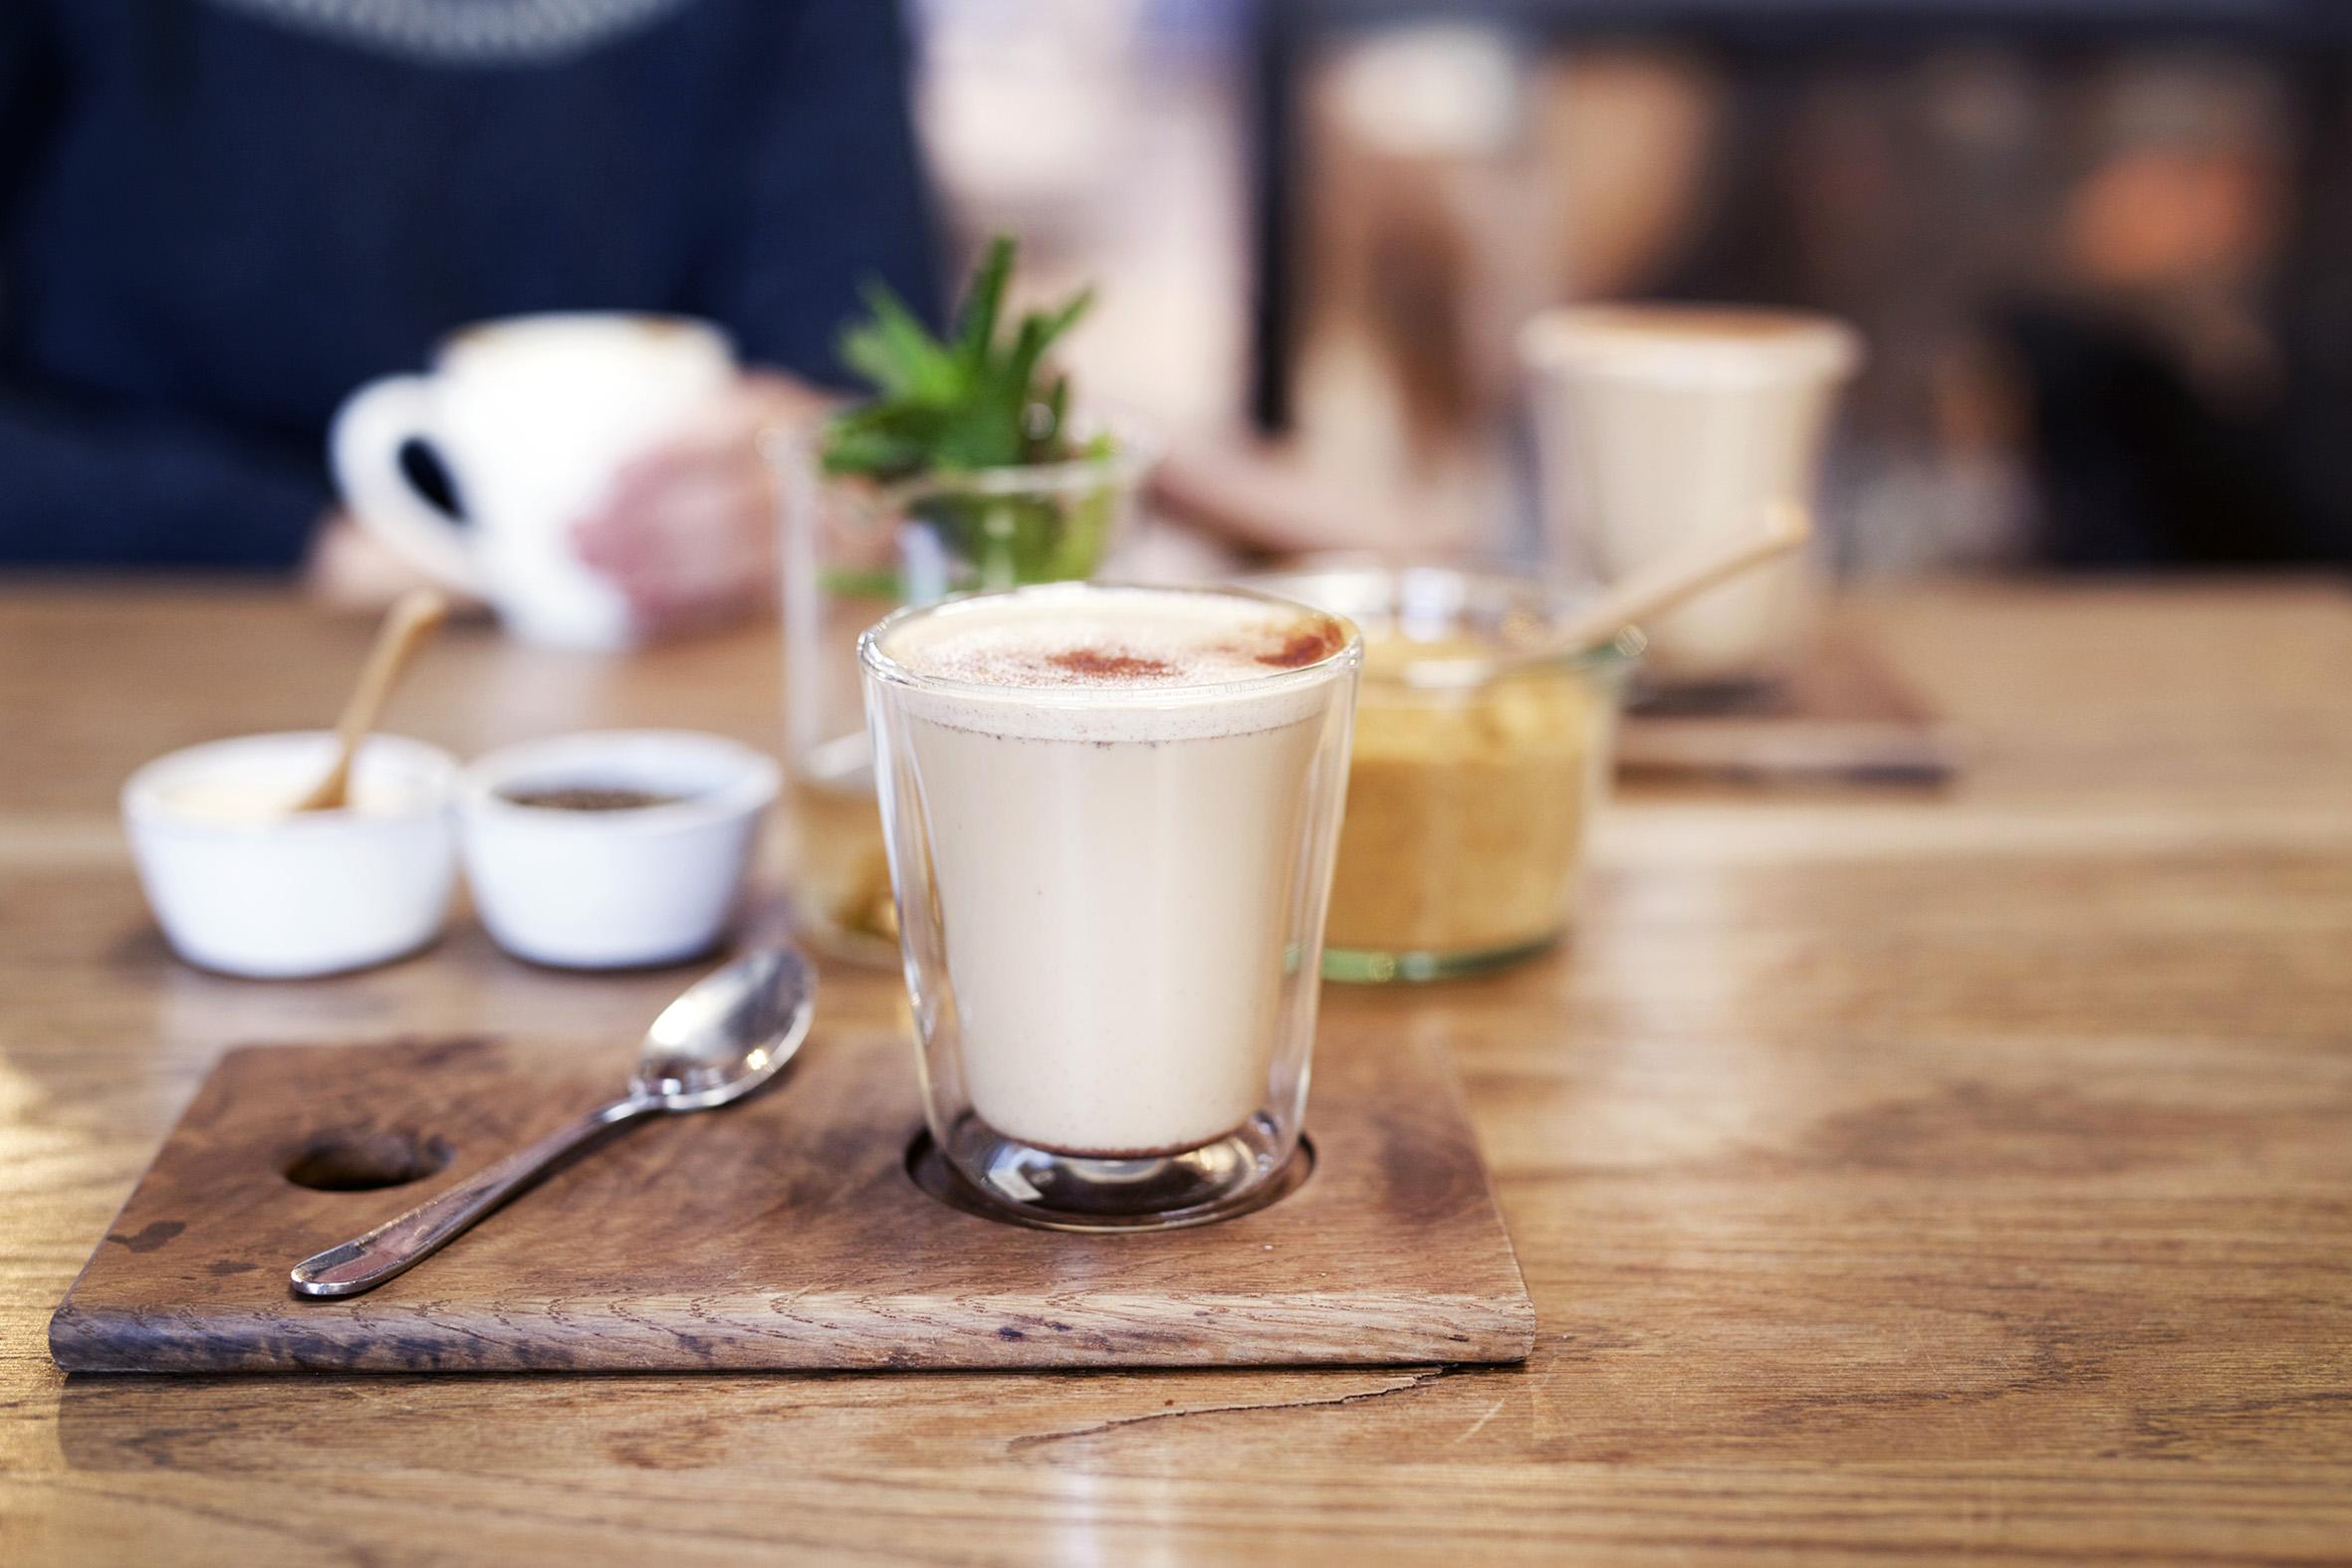 Oliver and york prana chai weytlandts 3.jpg